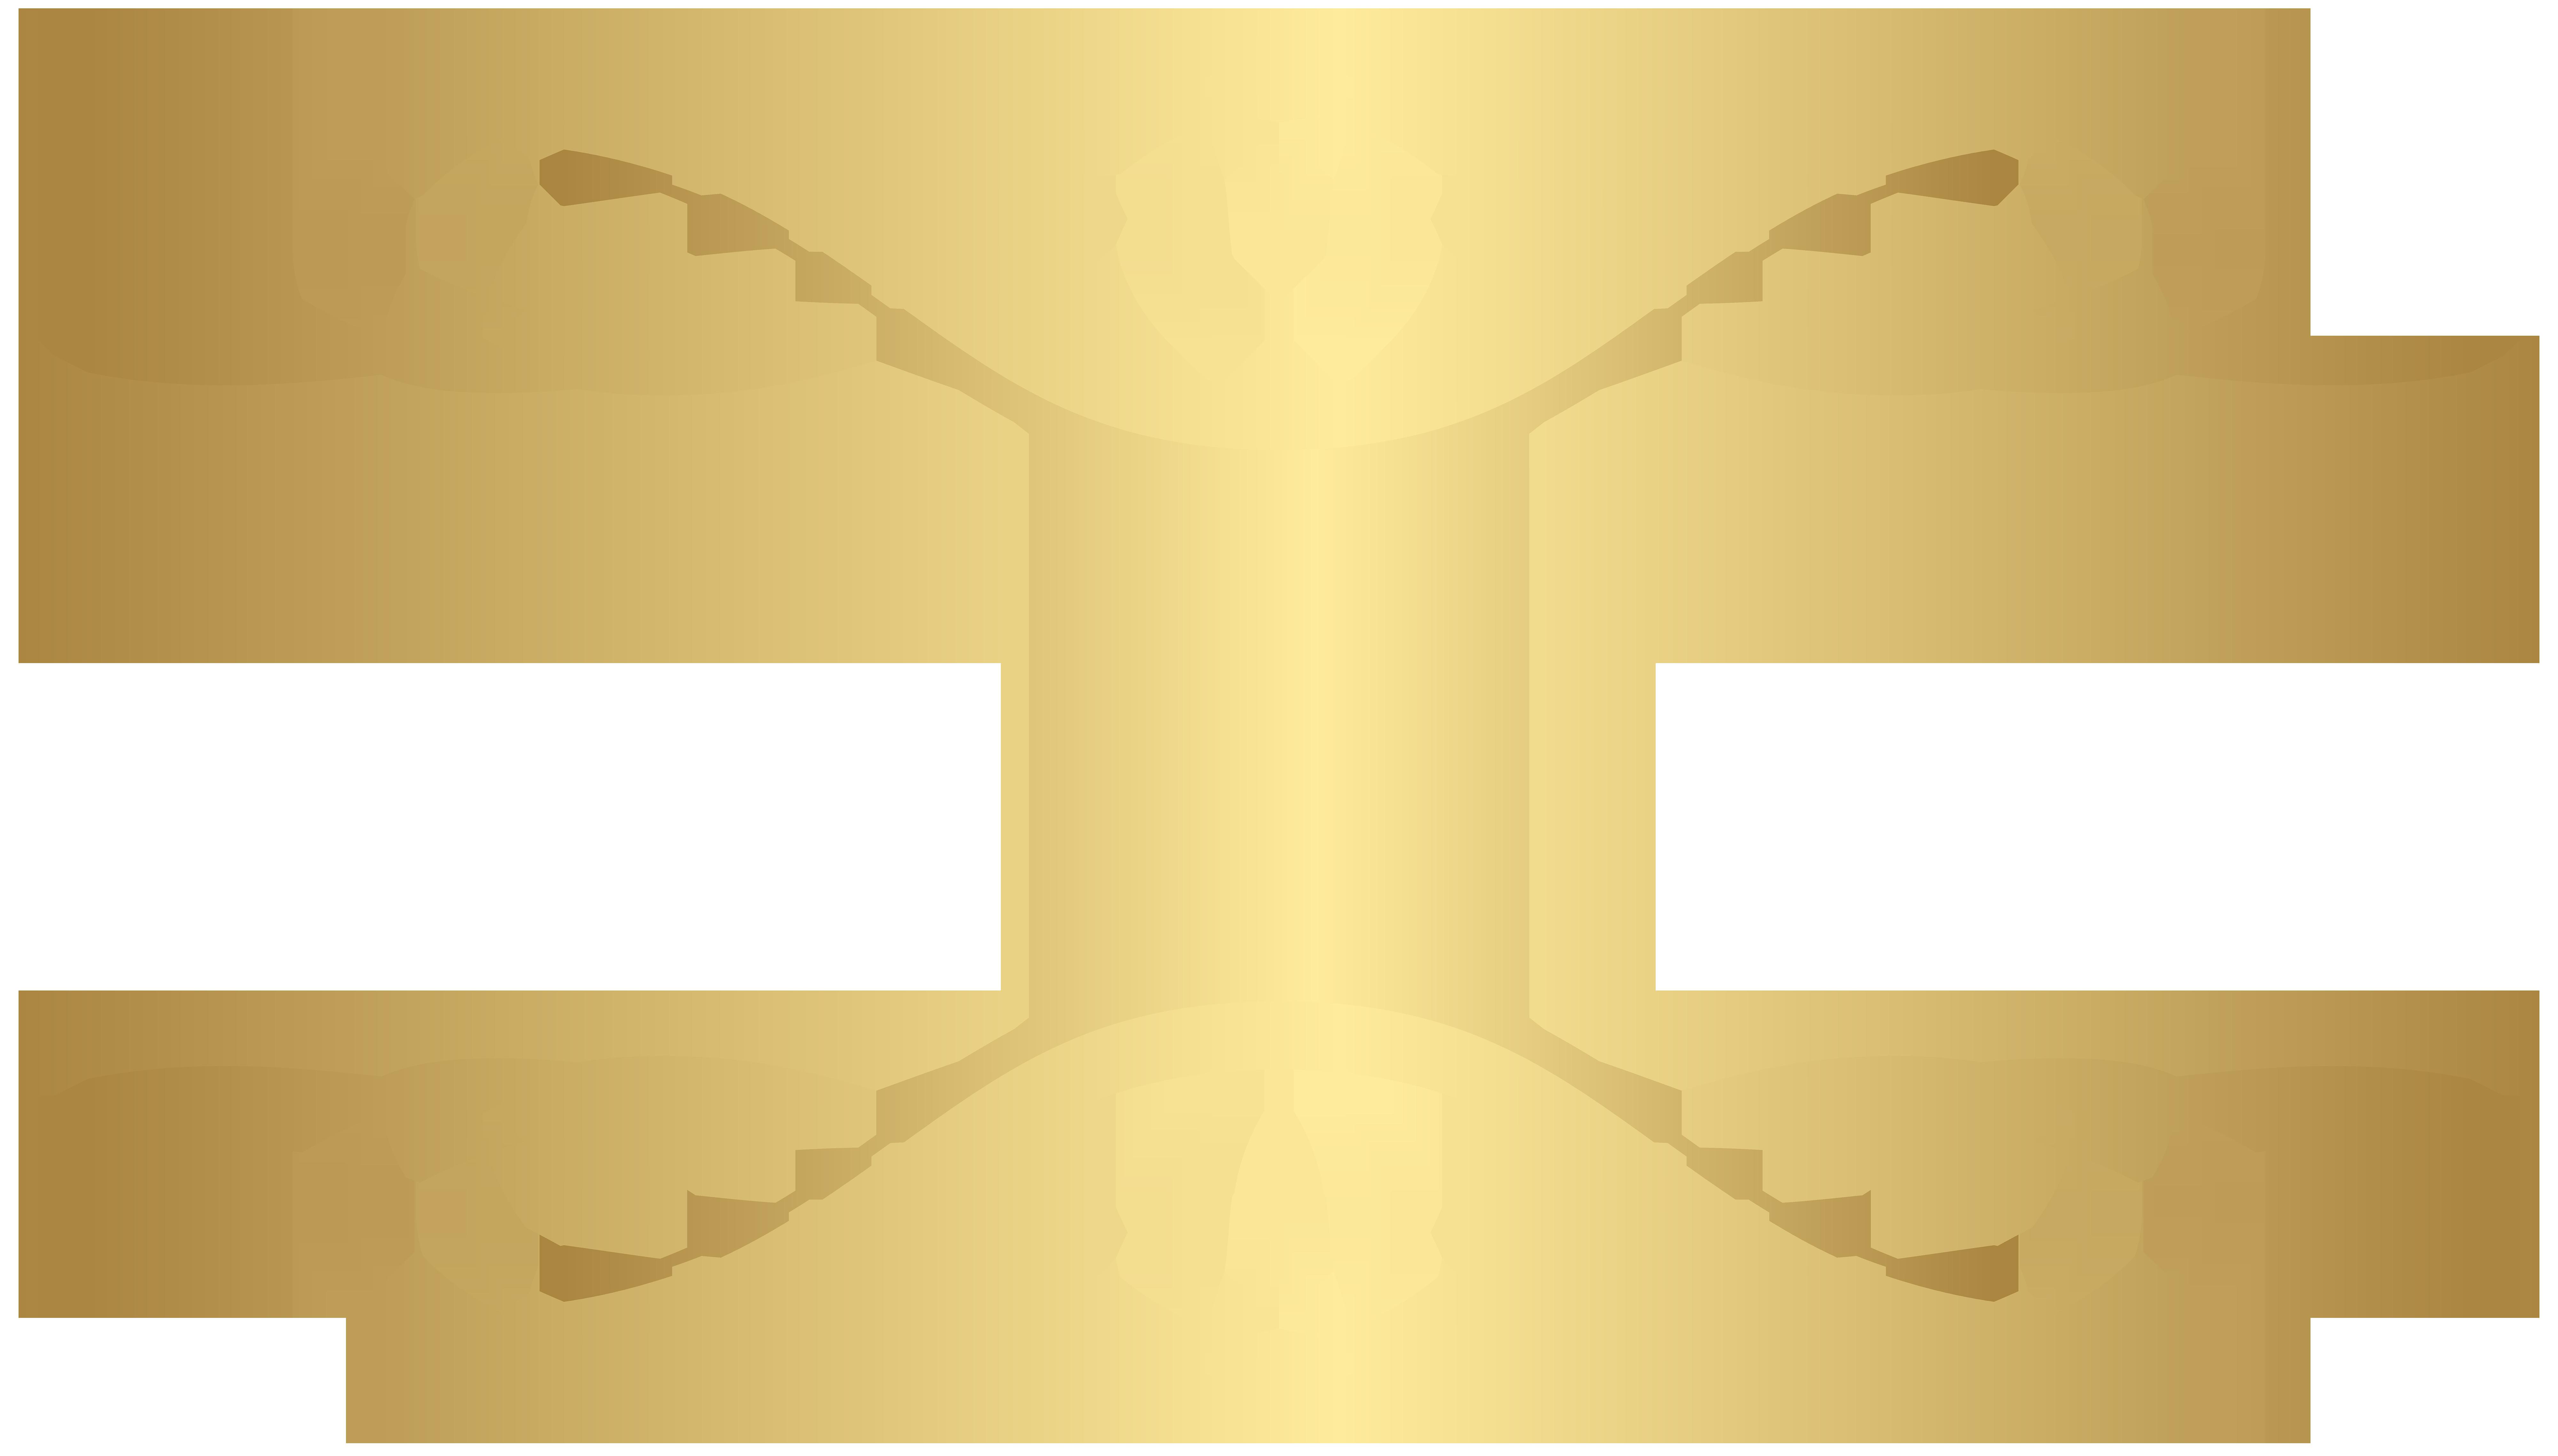 Pin by Nabeeljaat on Png  Clip art Wedding logo design